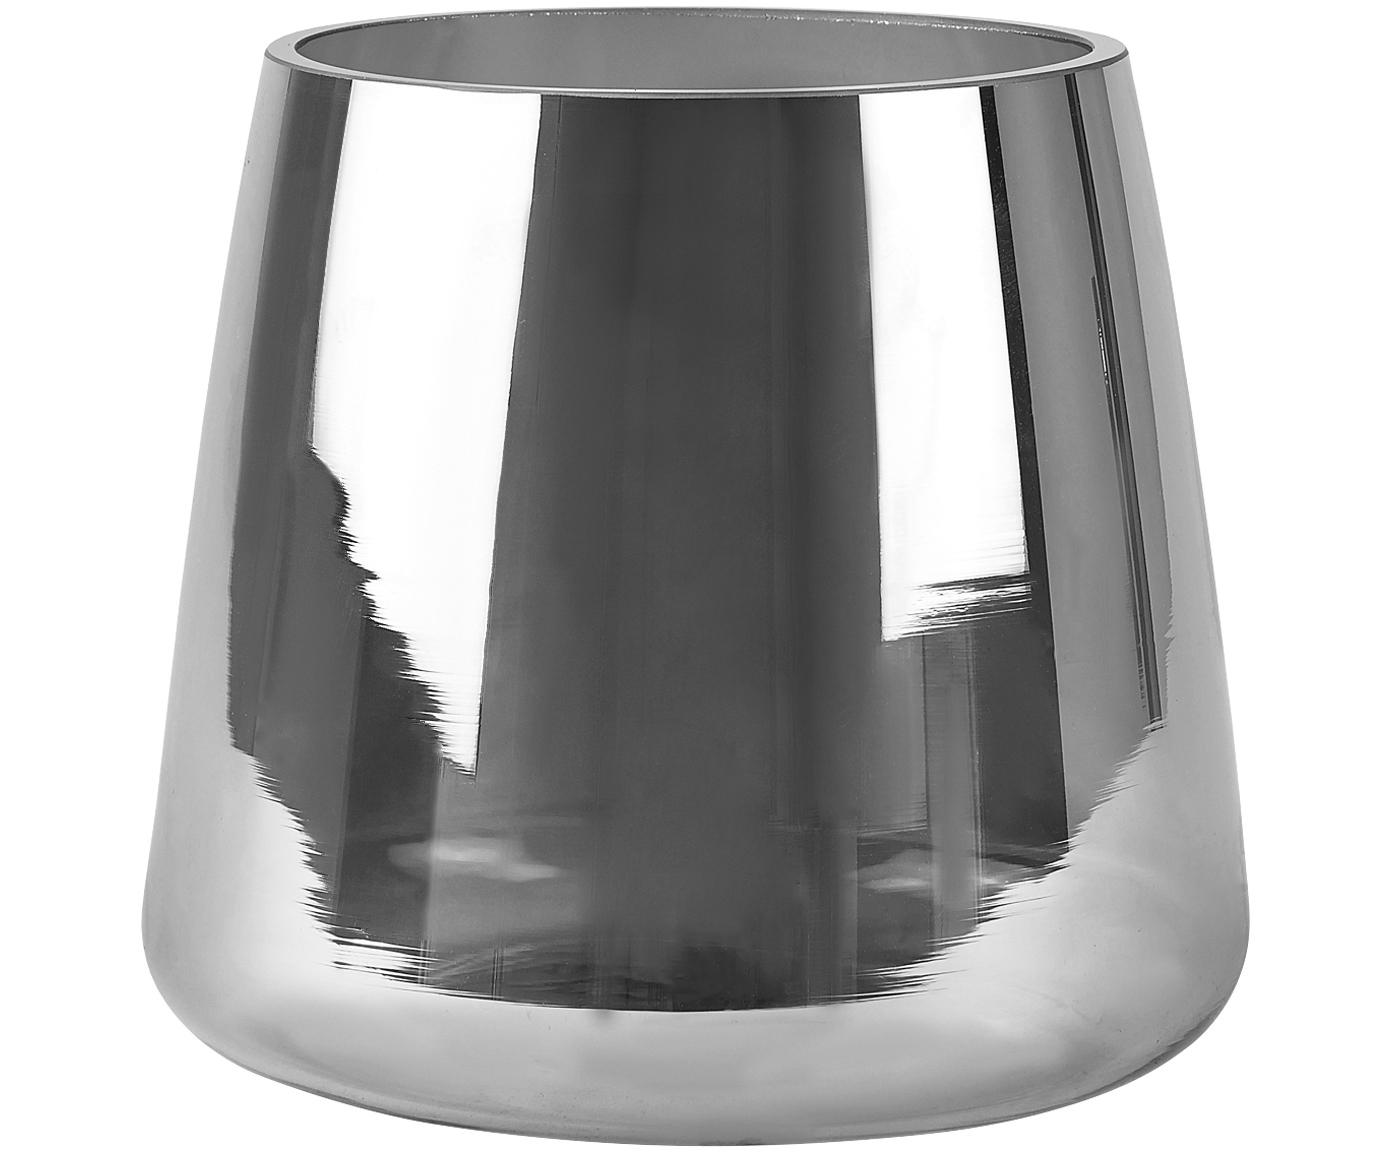 Jarrón de vidrio Carina, Vidrio, Plateado, transparente, Ø 18 x Al 16 cm